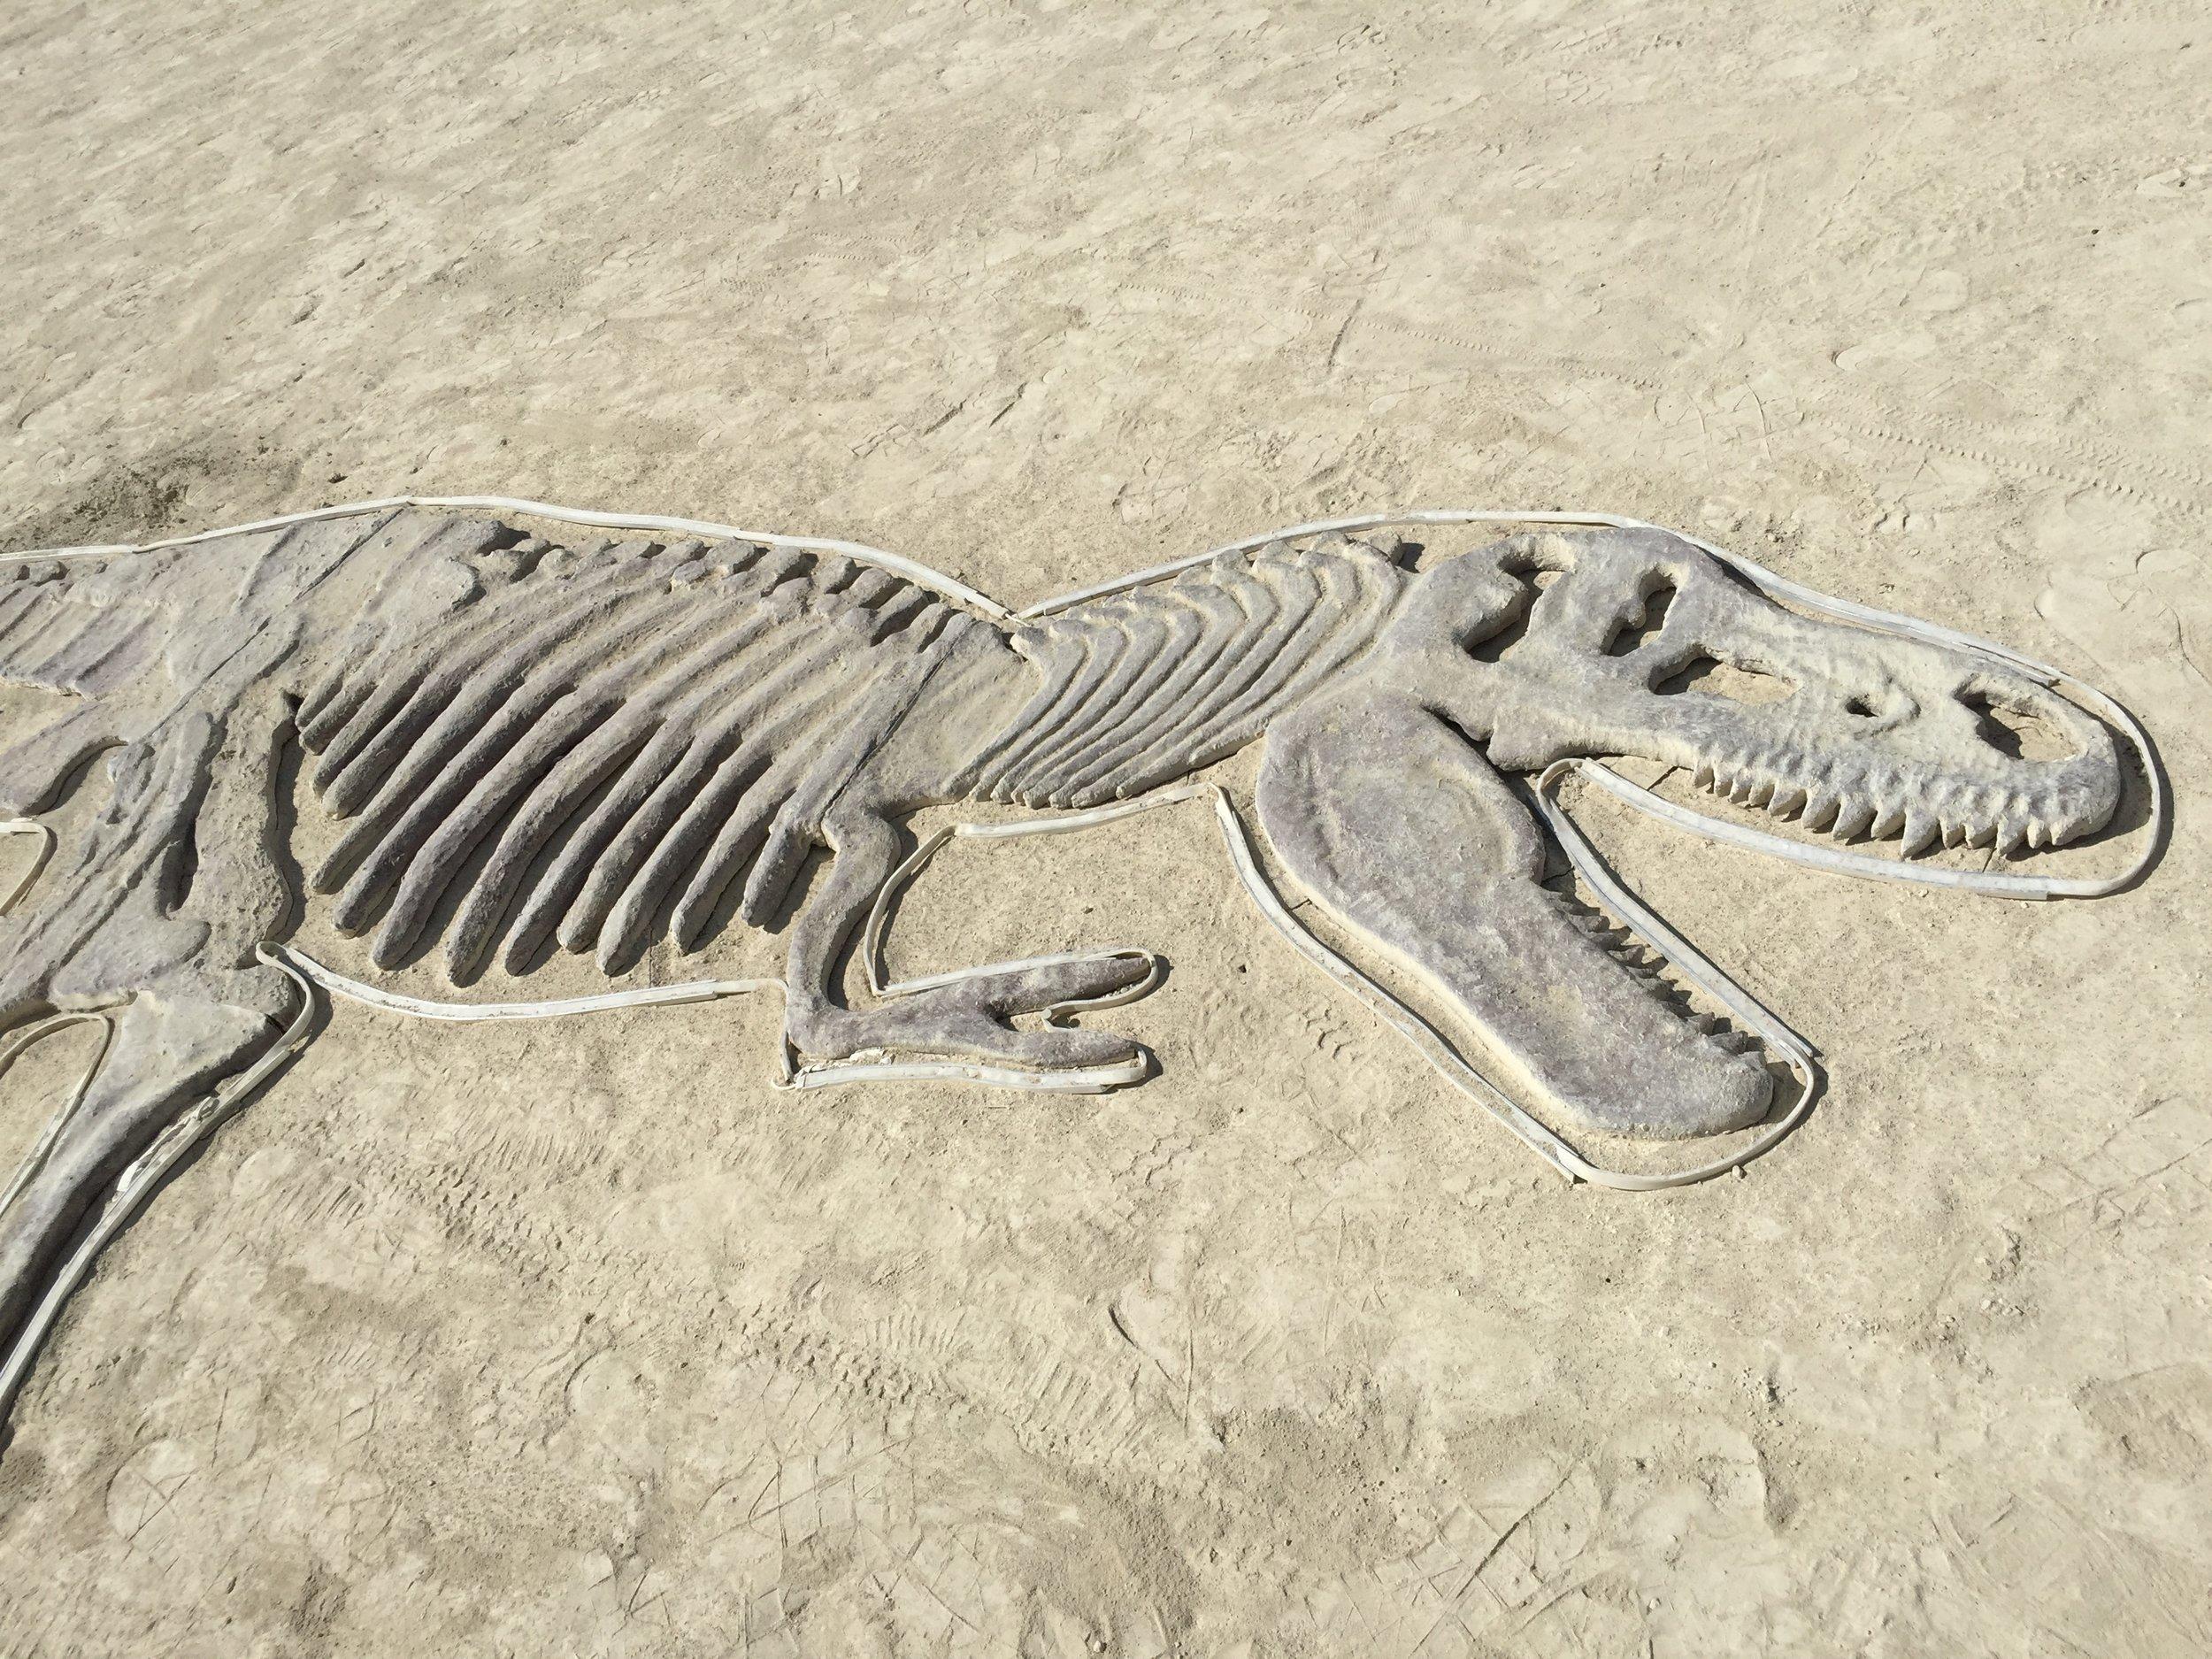 Yori Ben-Haim, dinosaur fossil, Burning Man, 2016